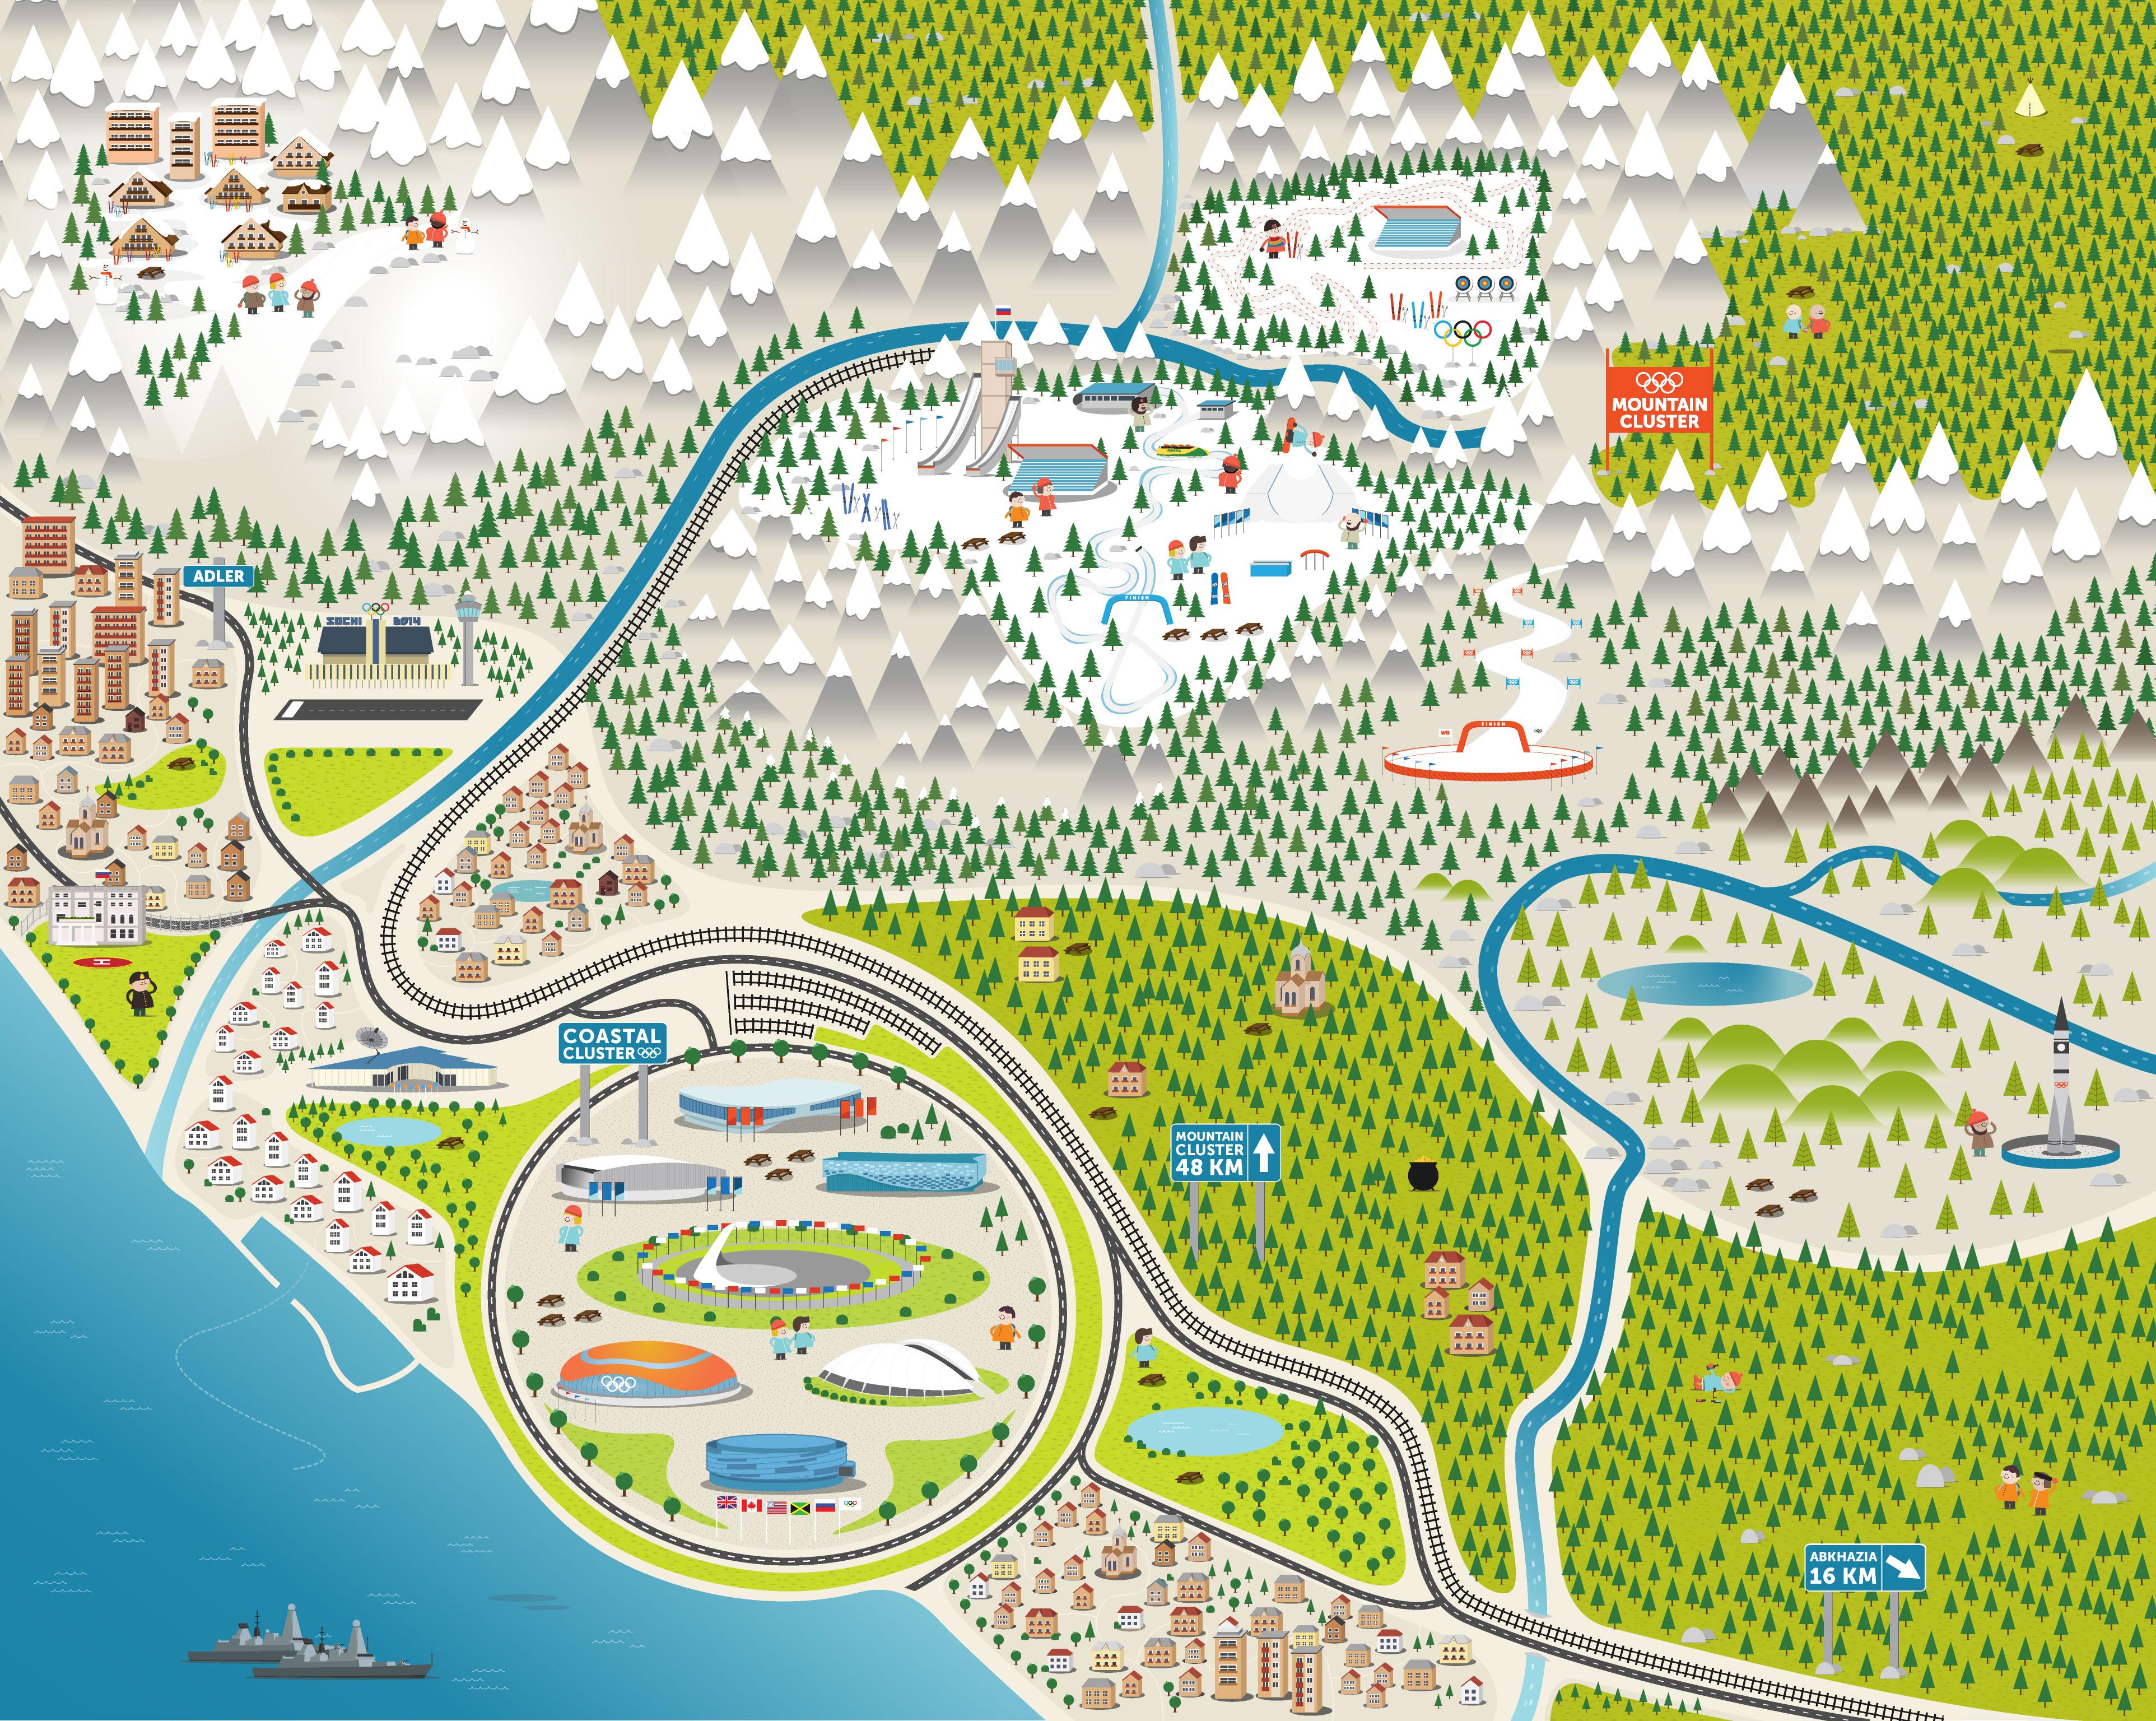 sochi mapa Sochi 2014 Interactive Map » From Fiasco Design sochi mapa